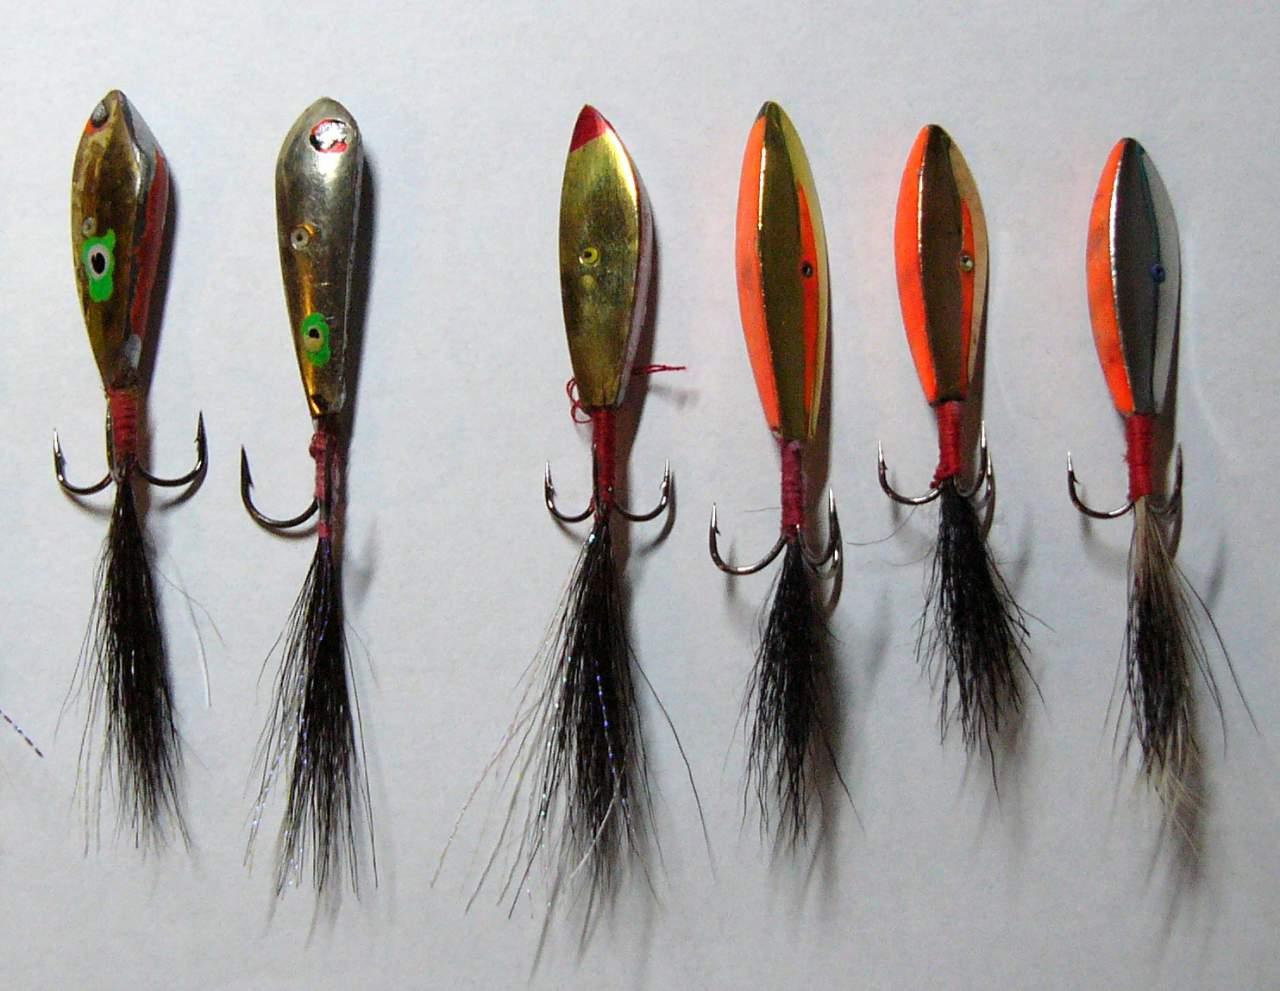 приманка оса для ловли судака